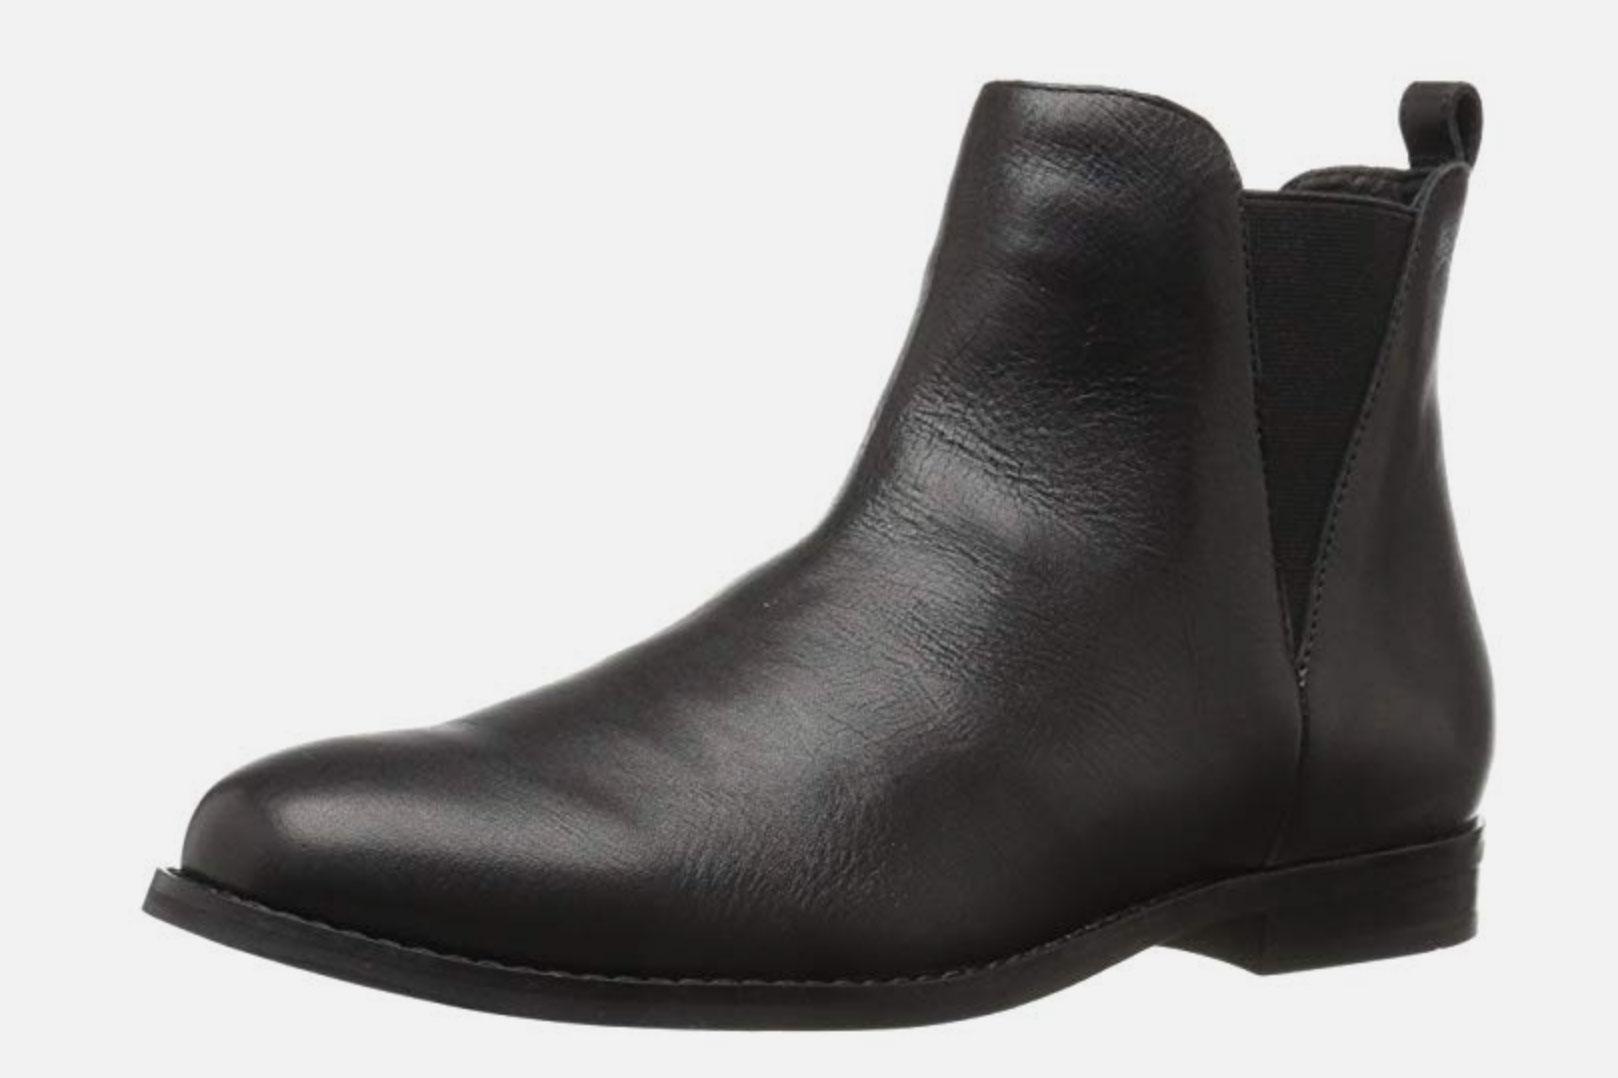 Amazon Brand - 206 Collective Women's Ballard Chelsea Ankle Boot